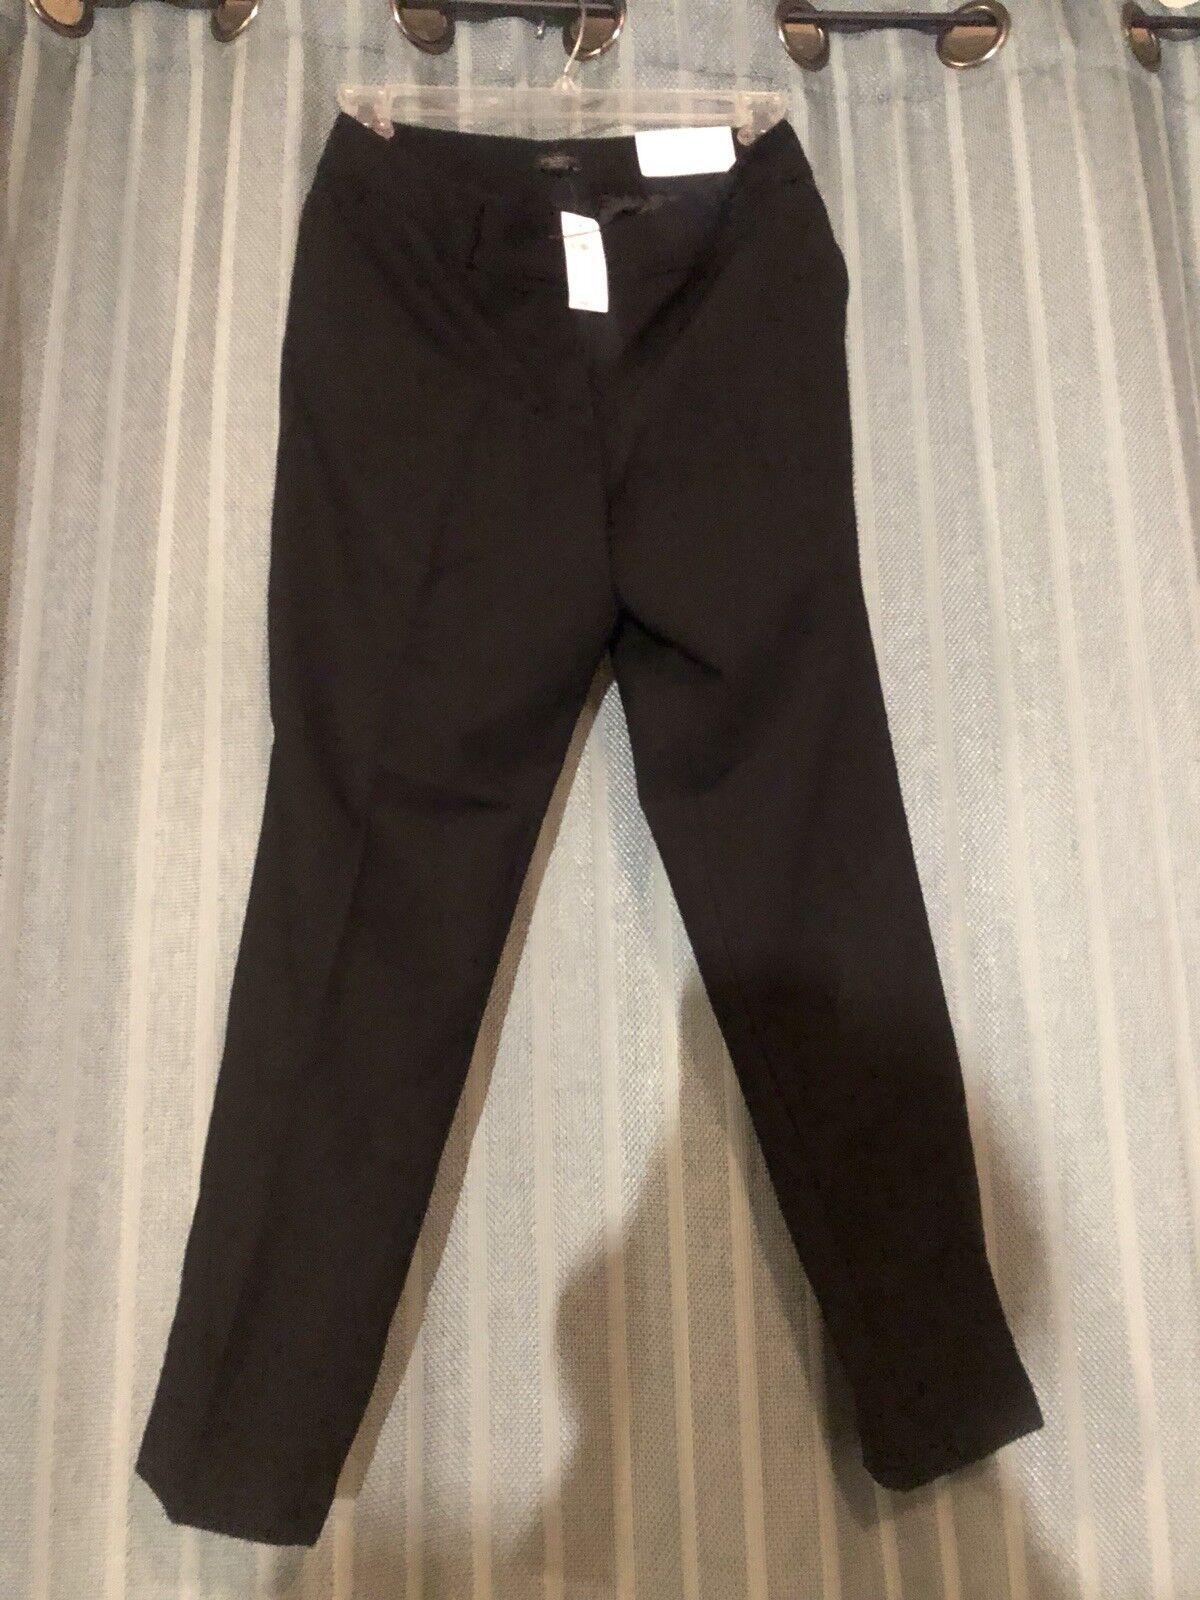 Ann Taylor Curvy Pants Size 10